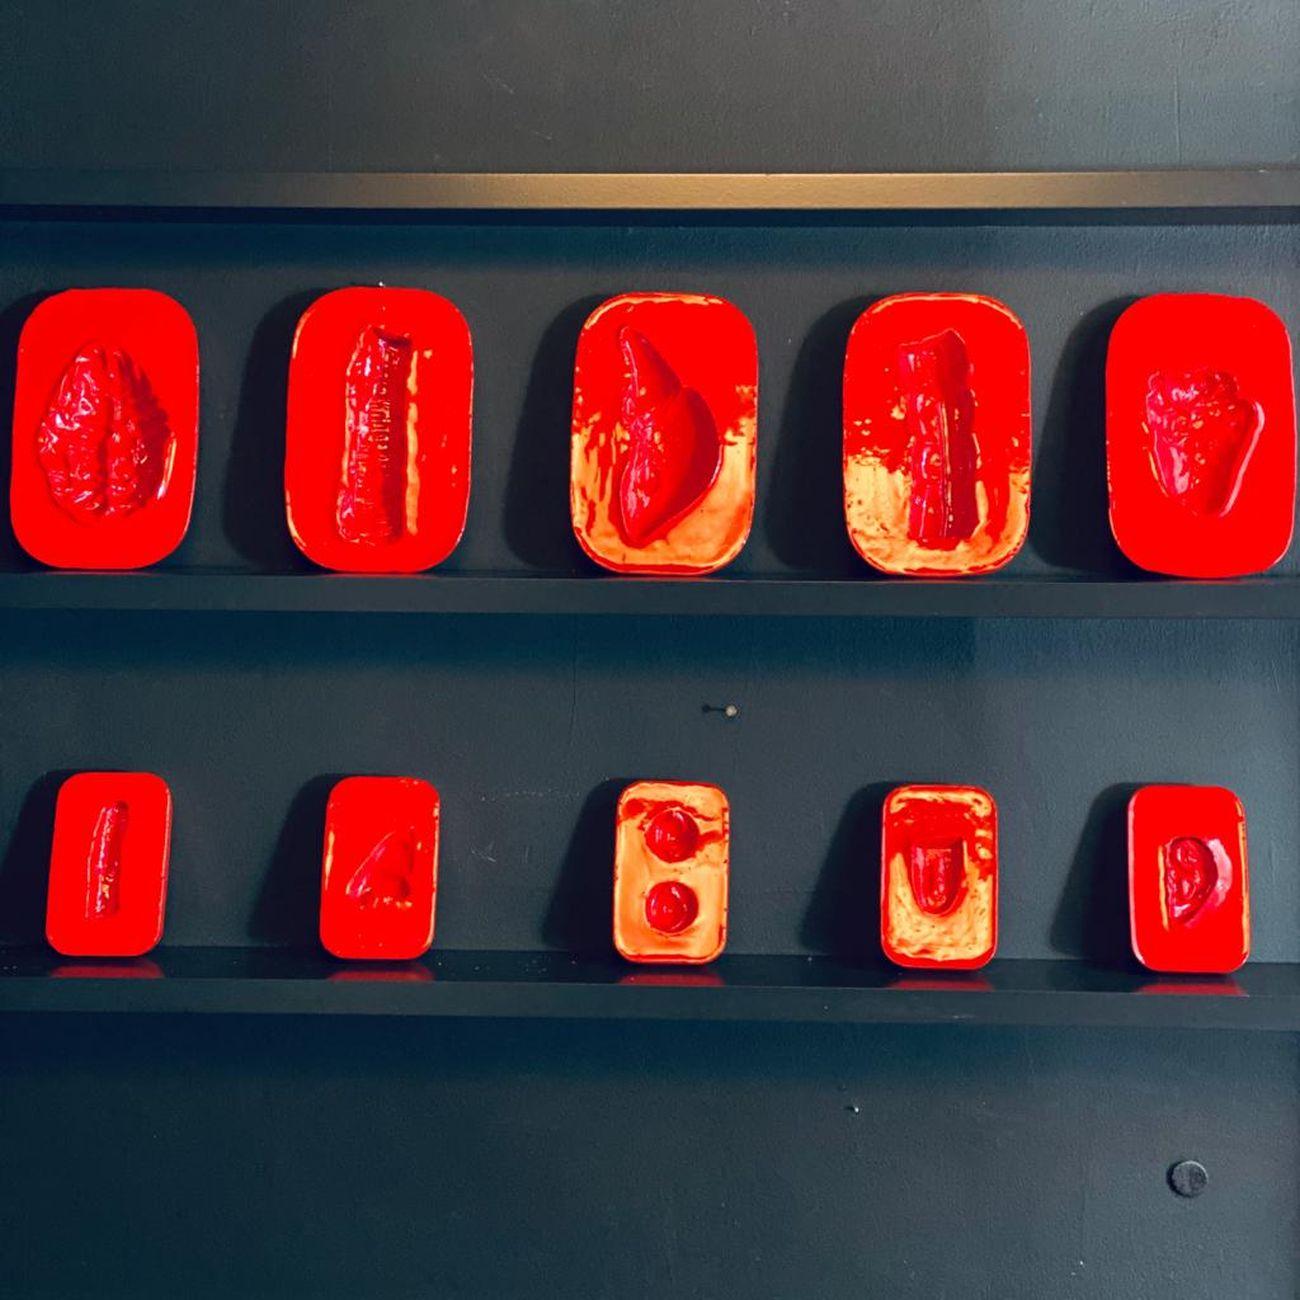 Ubi Consistam. Exhibition view at Foyer Gallery, New York 2020